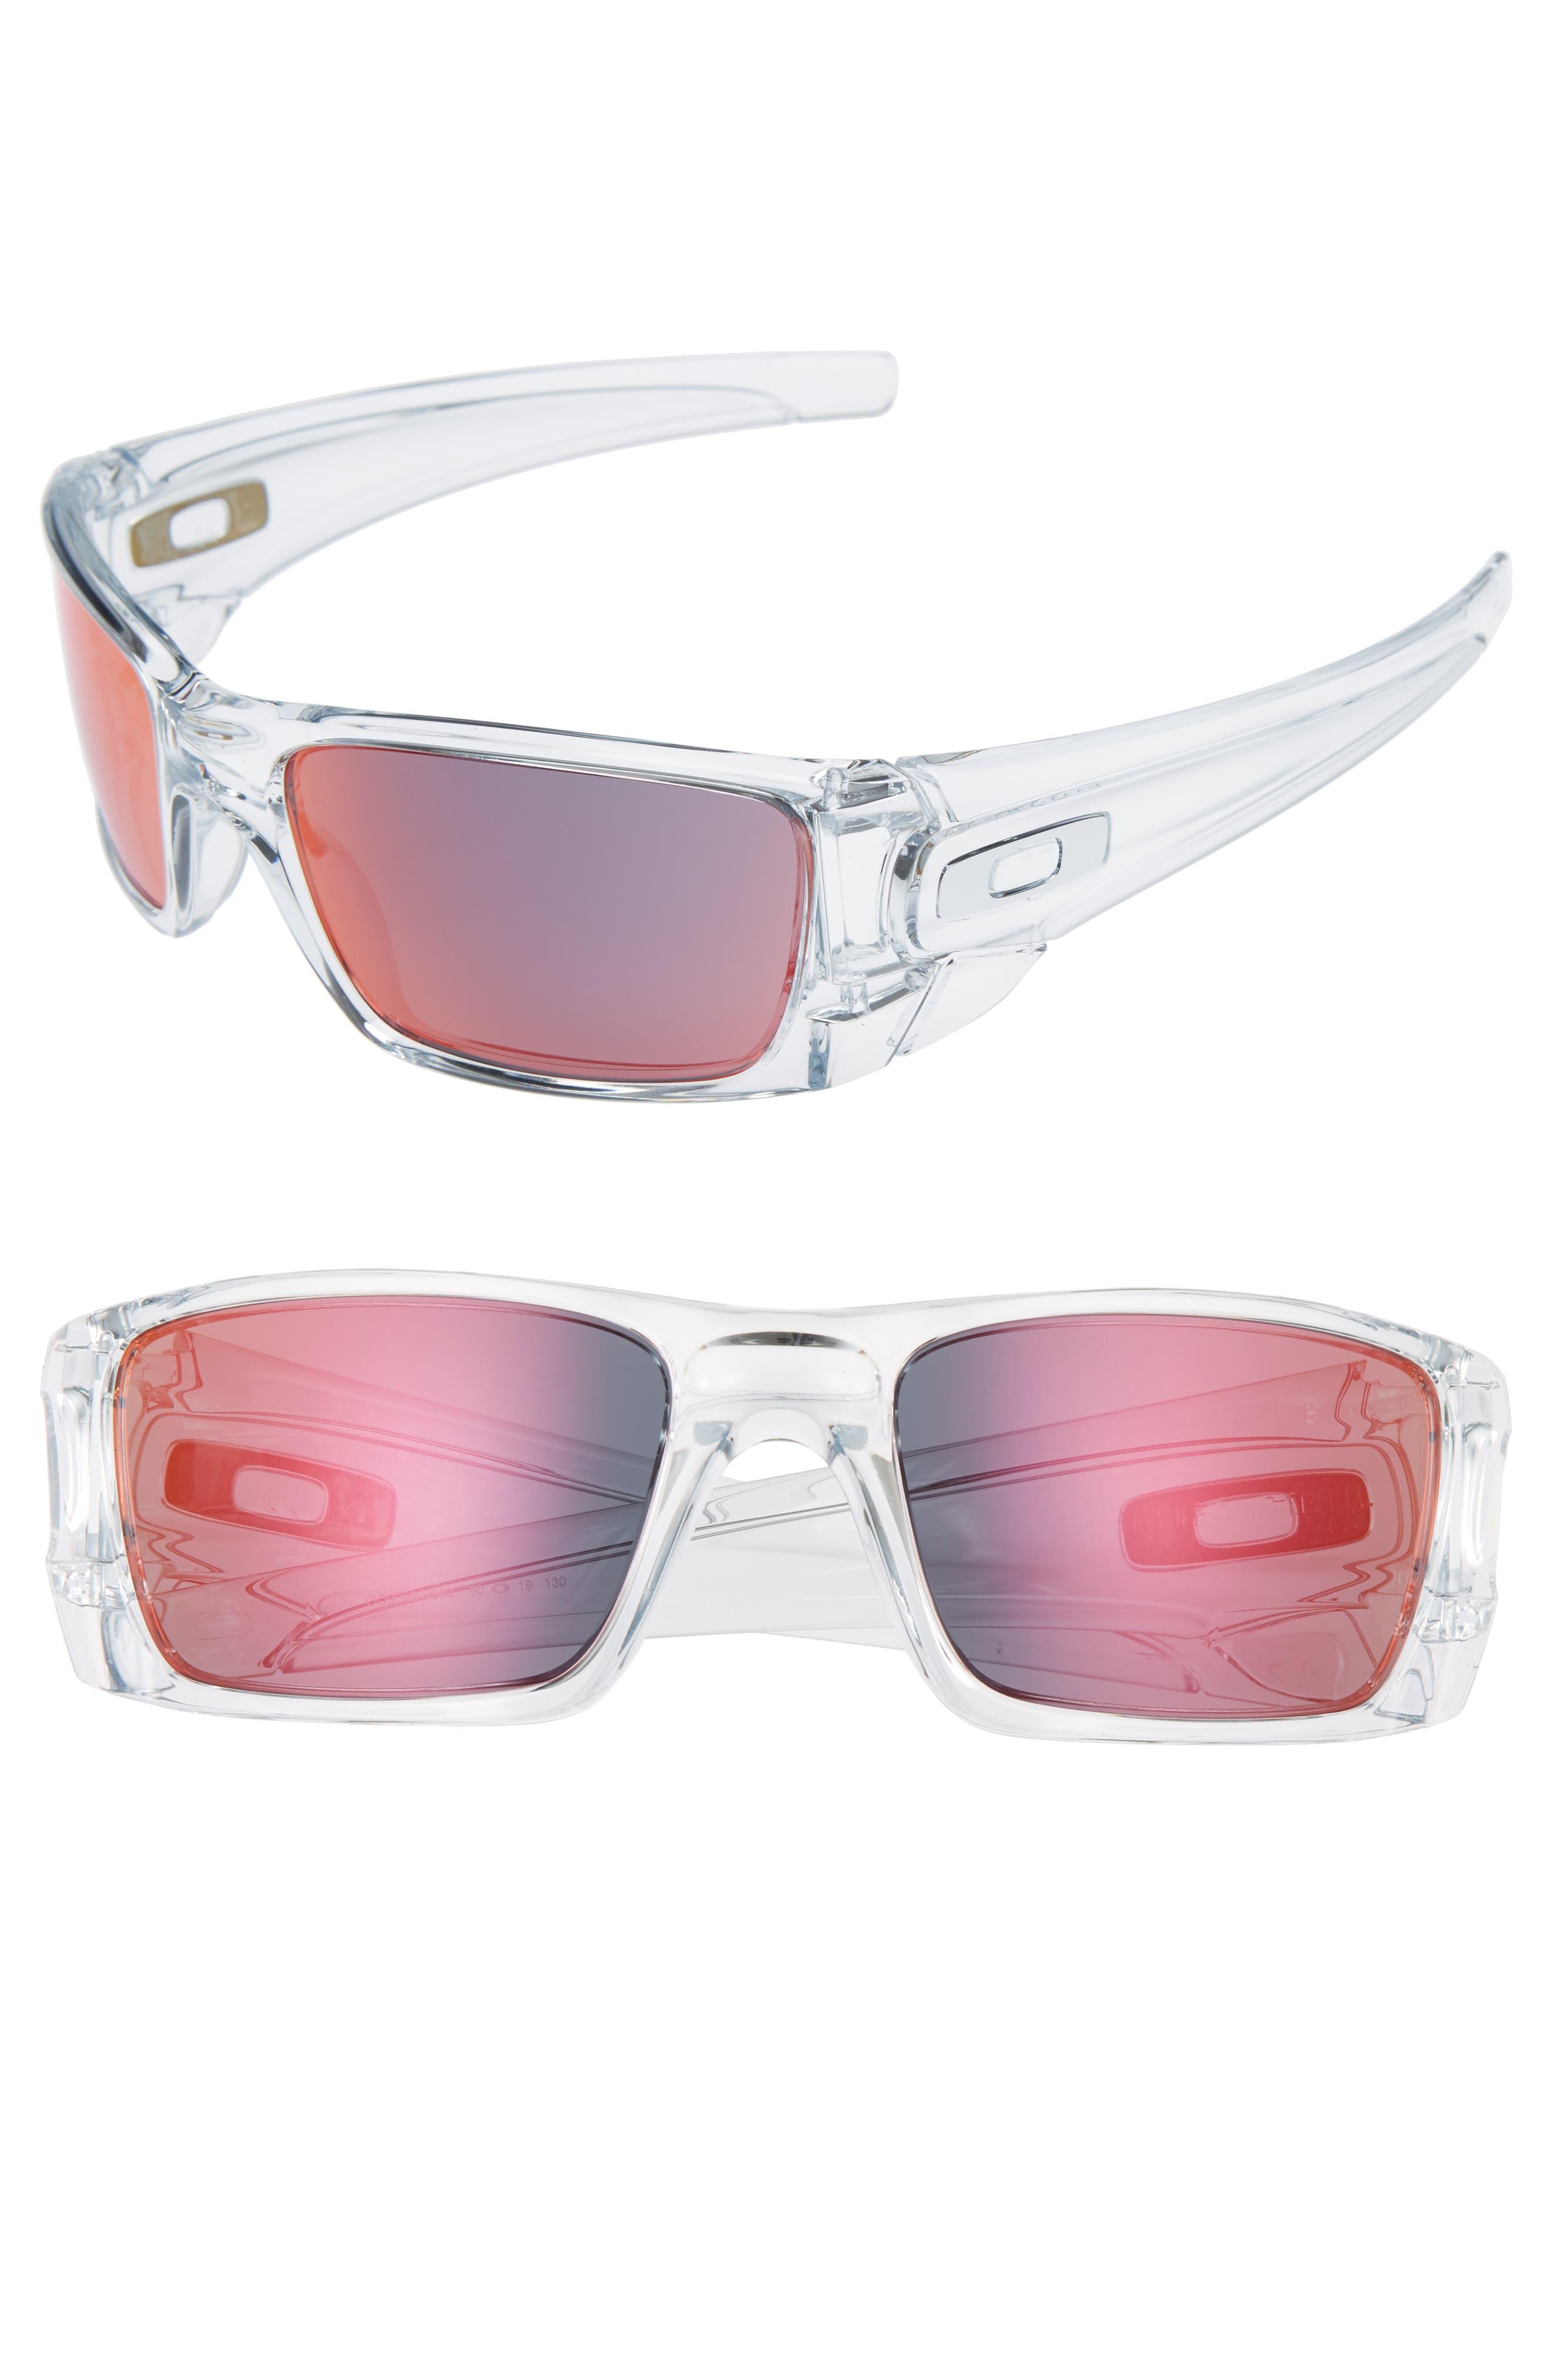 Oakley Fuel Cell 60mm Sunglasses